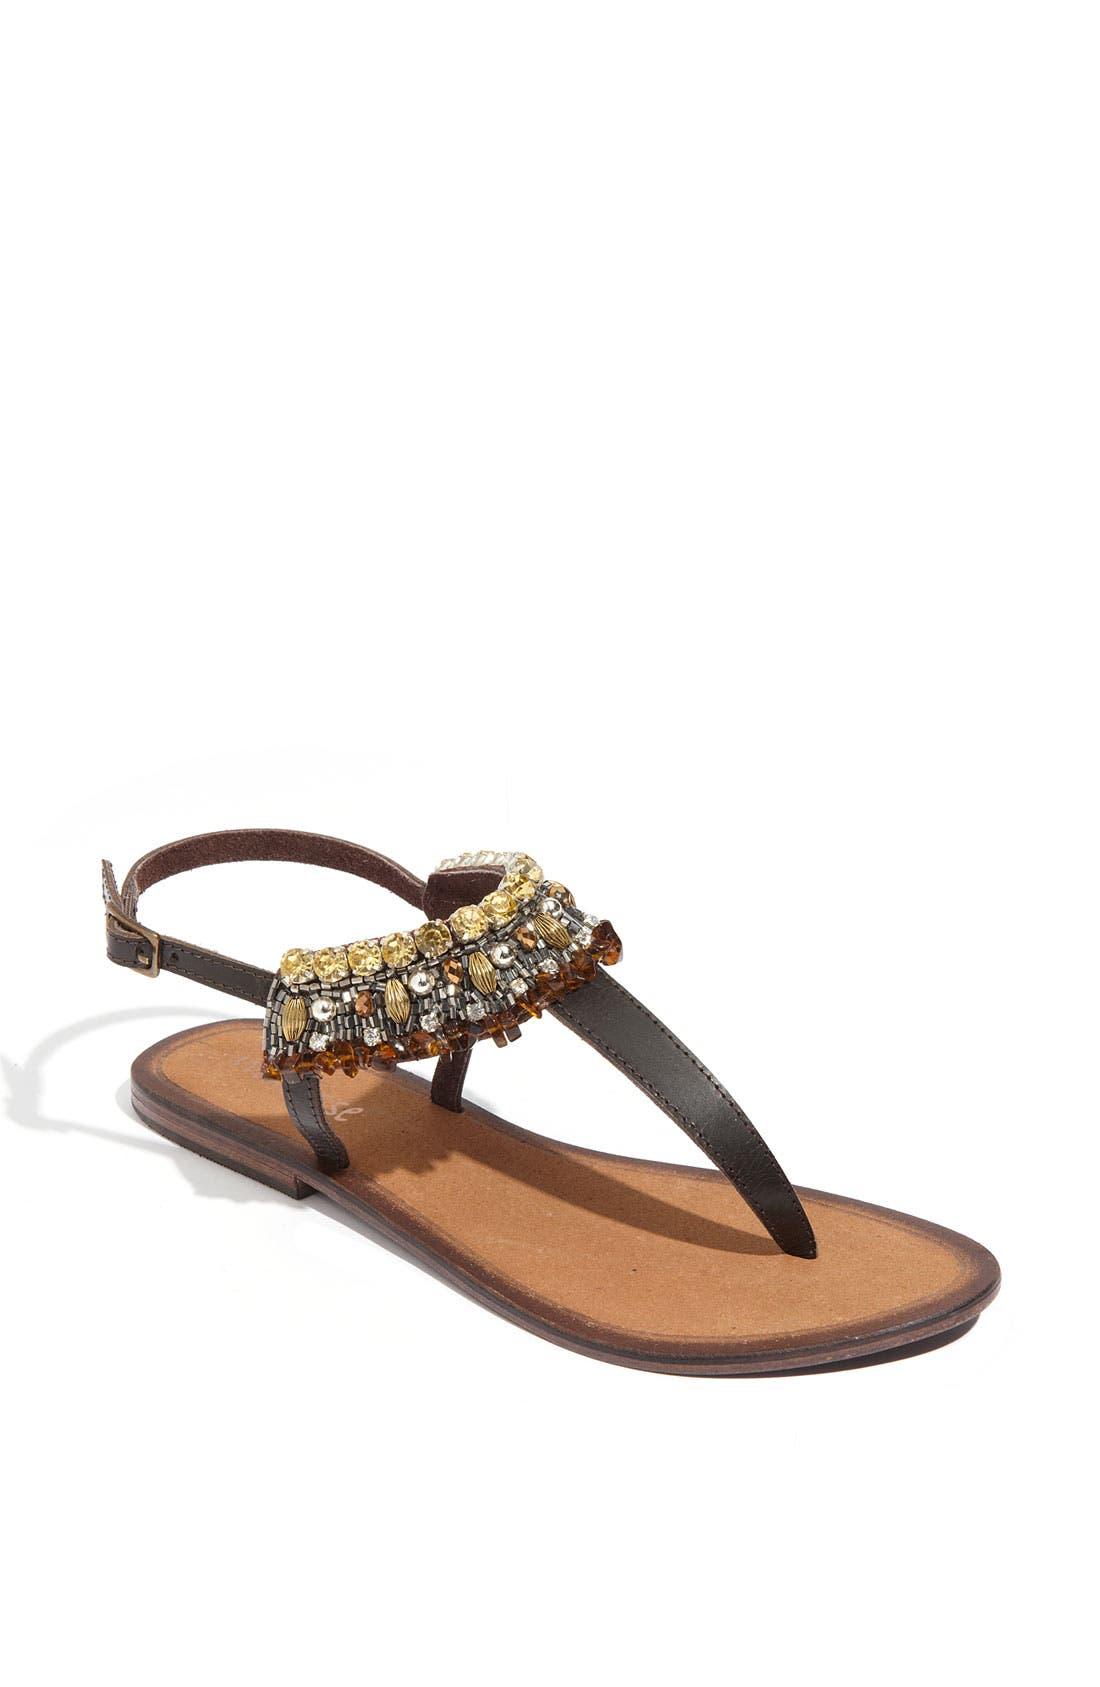 Main Image - Matisse 'Michelle' Sandal